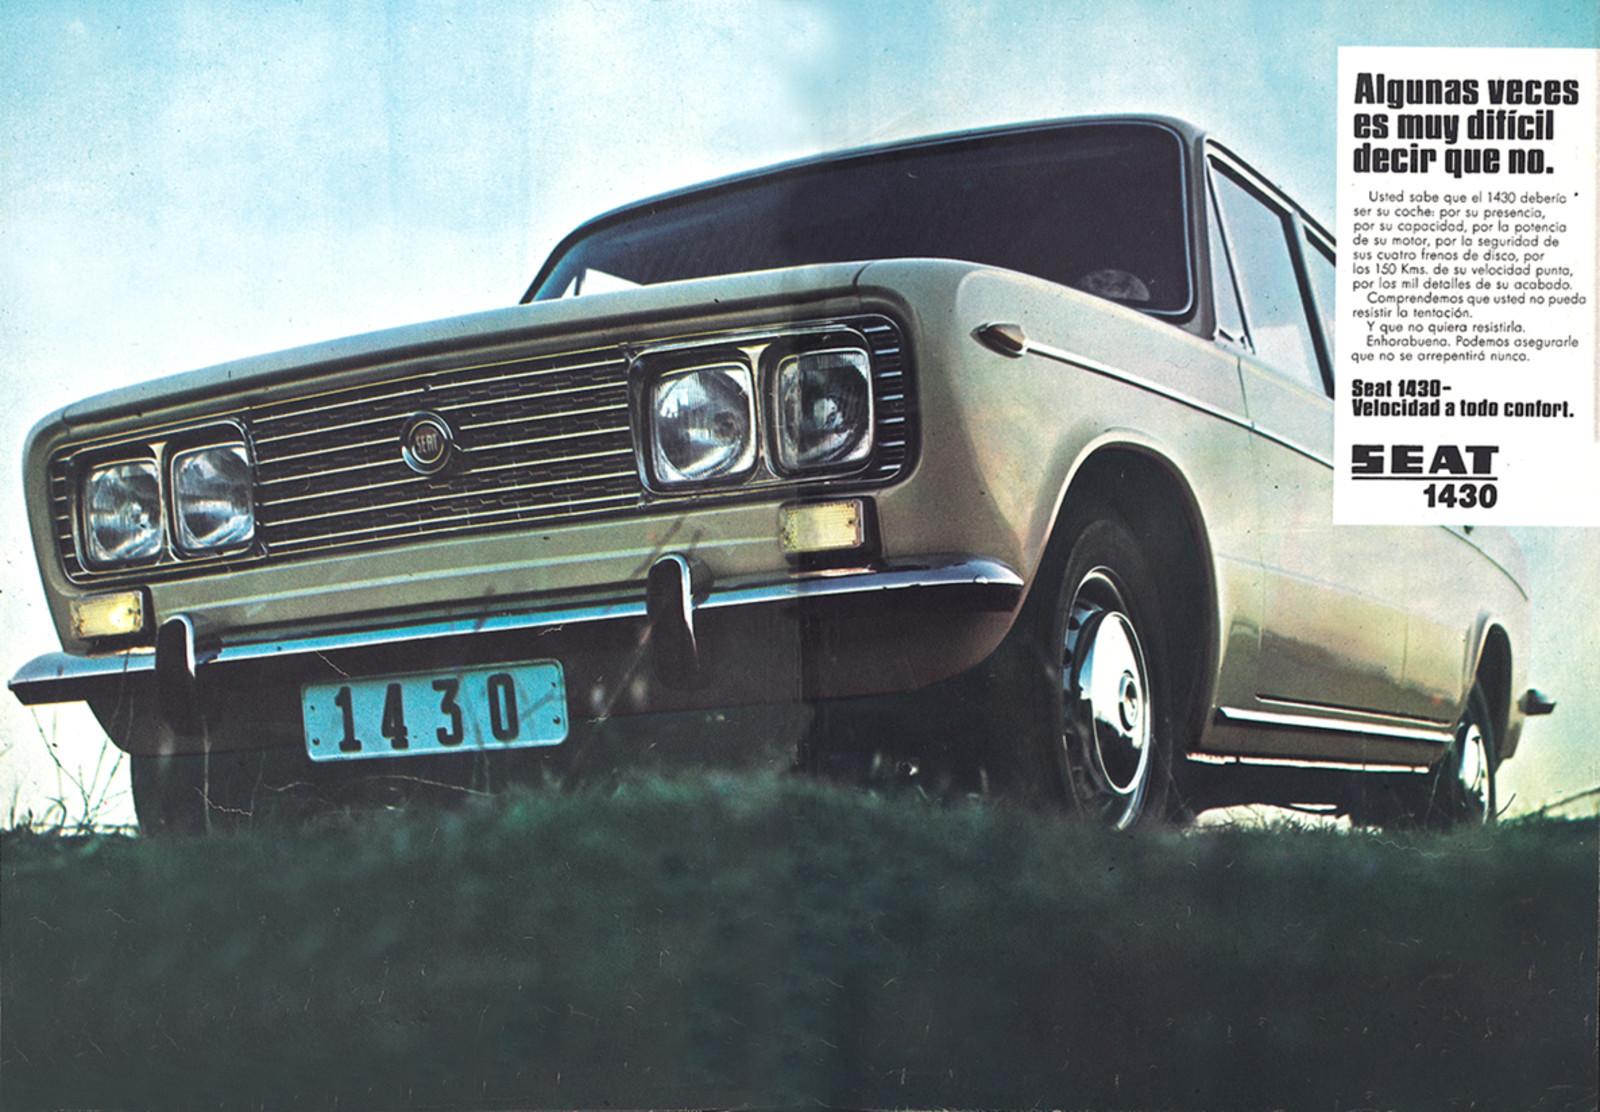 Foto de Motor SEAT 1430 - fotos históricas (4/49)